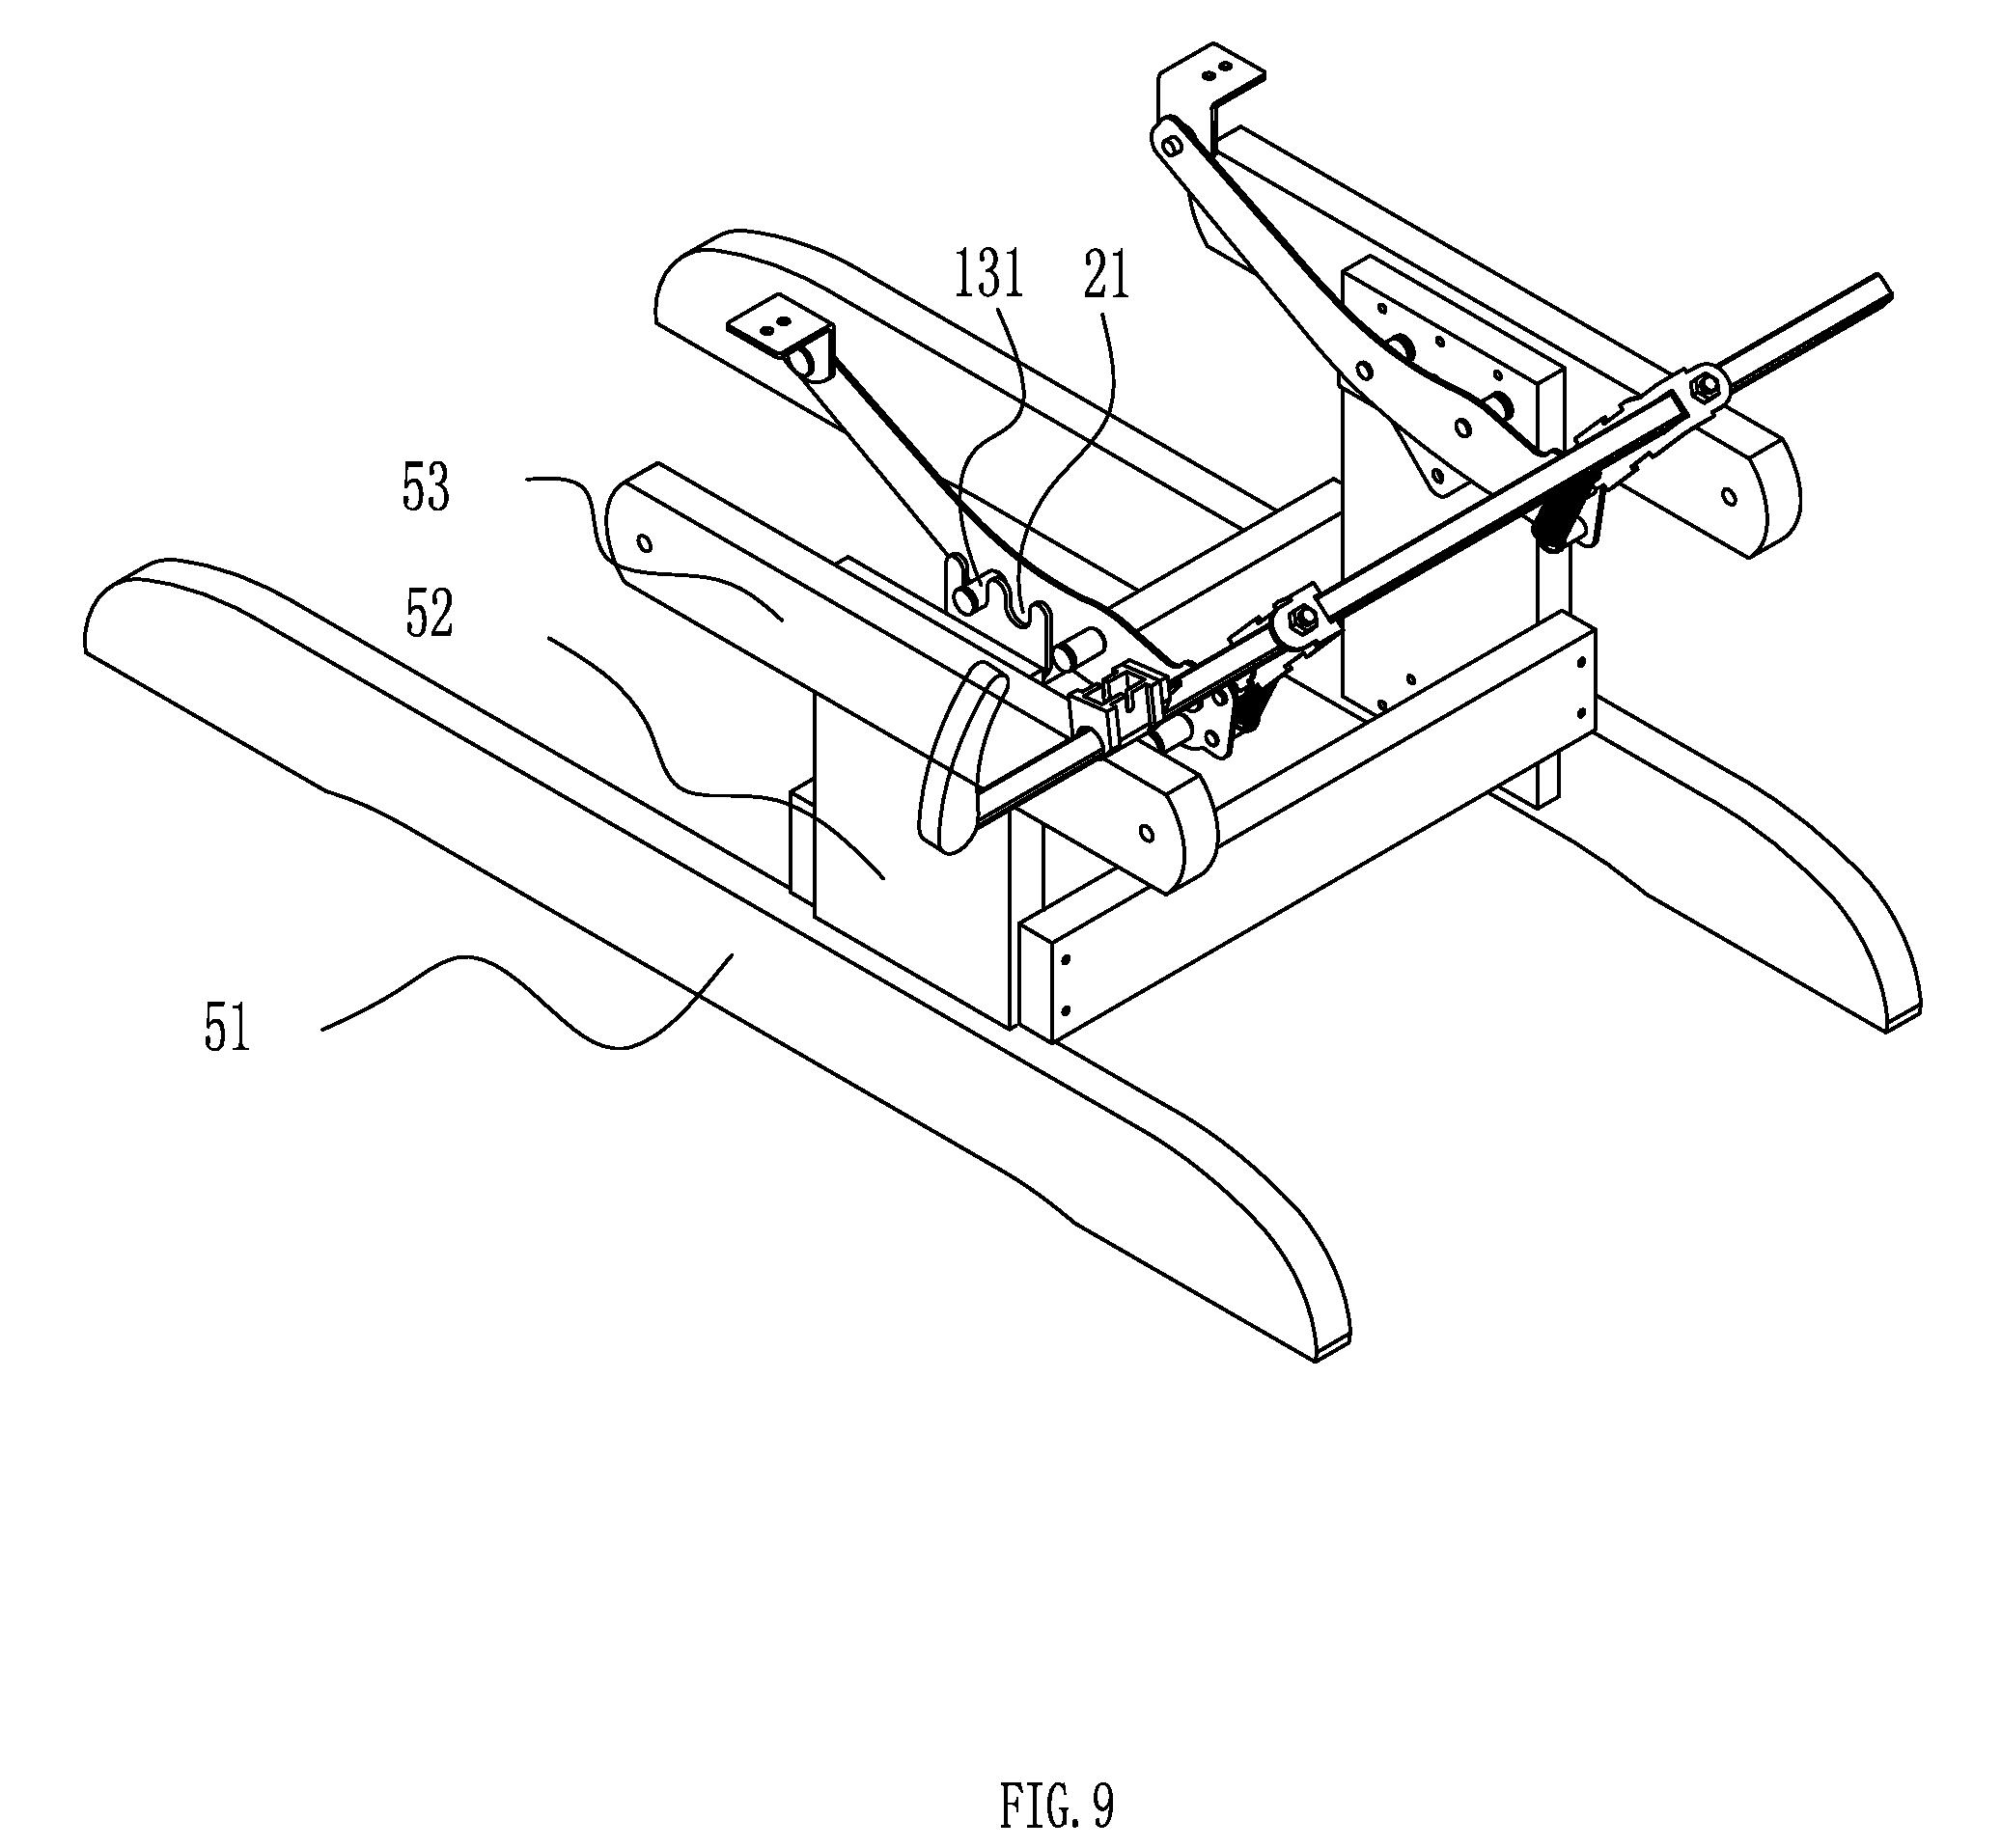 patent us8096614 - locking mechanism